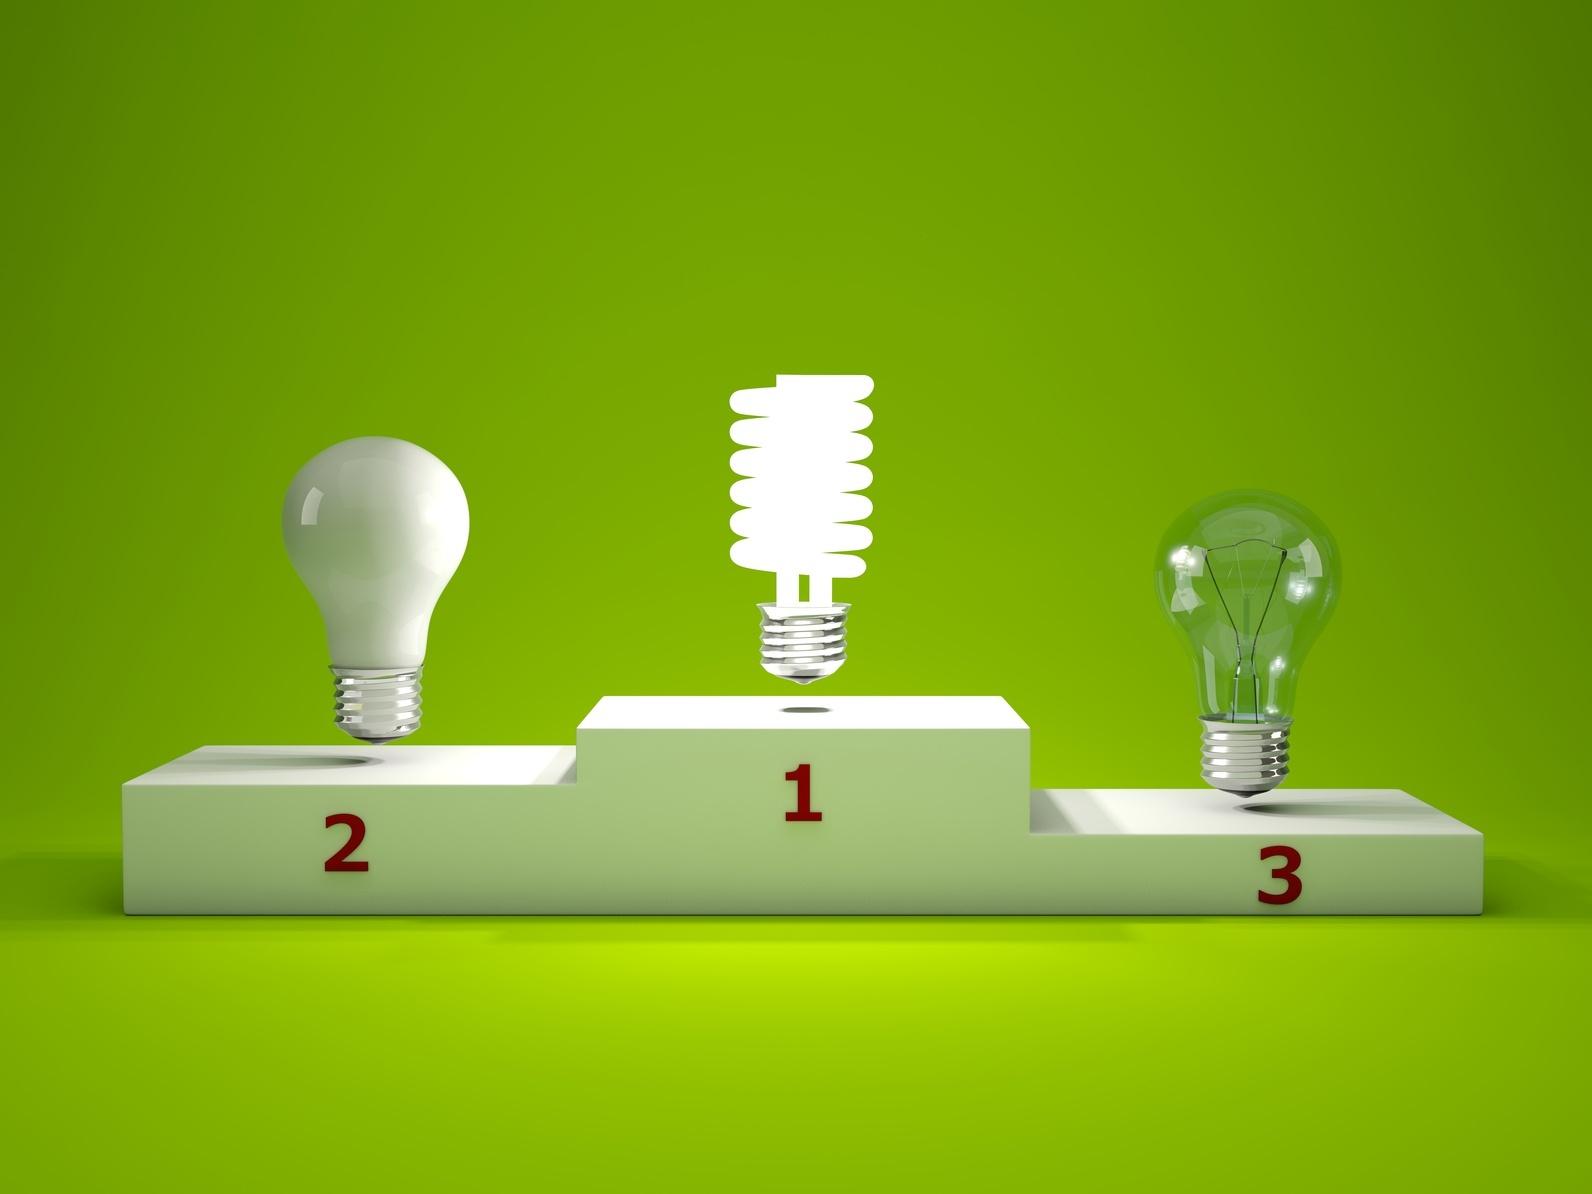 Energy efficient light bulb on podium